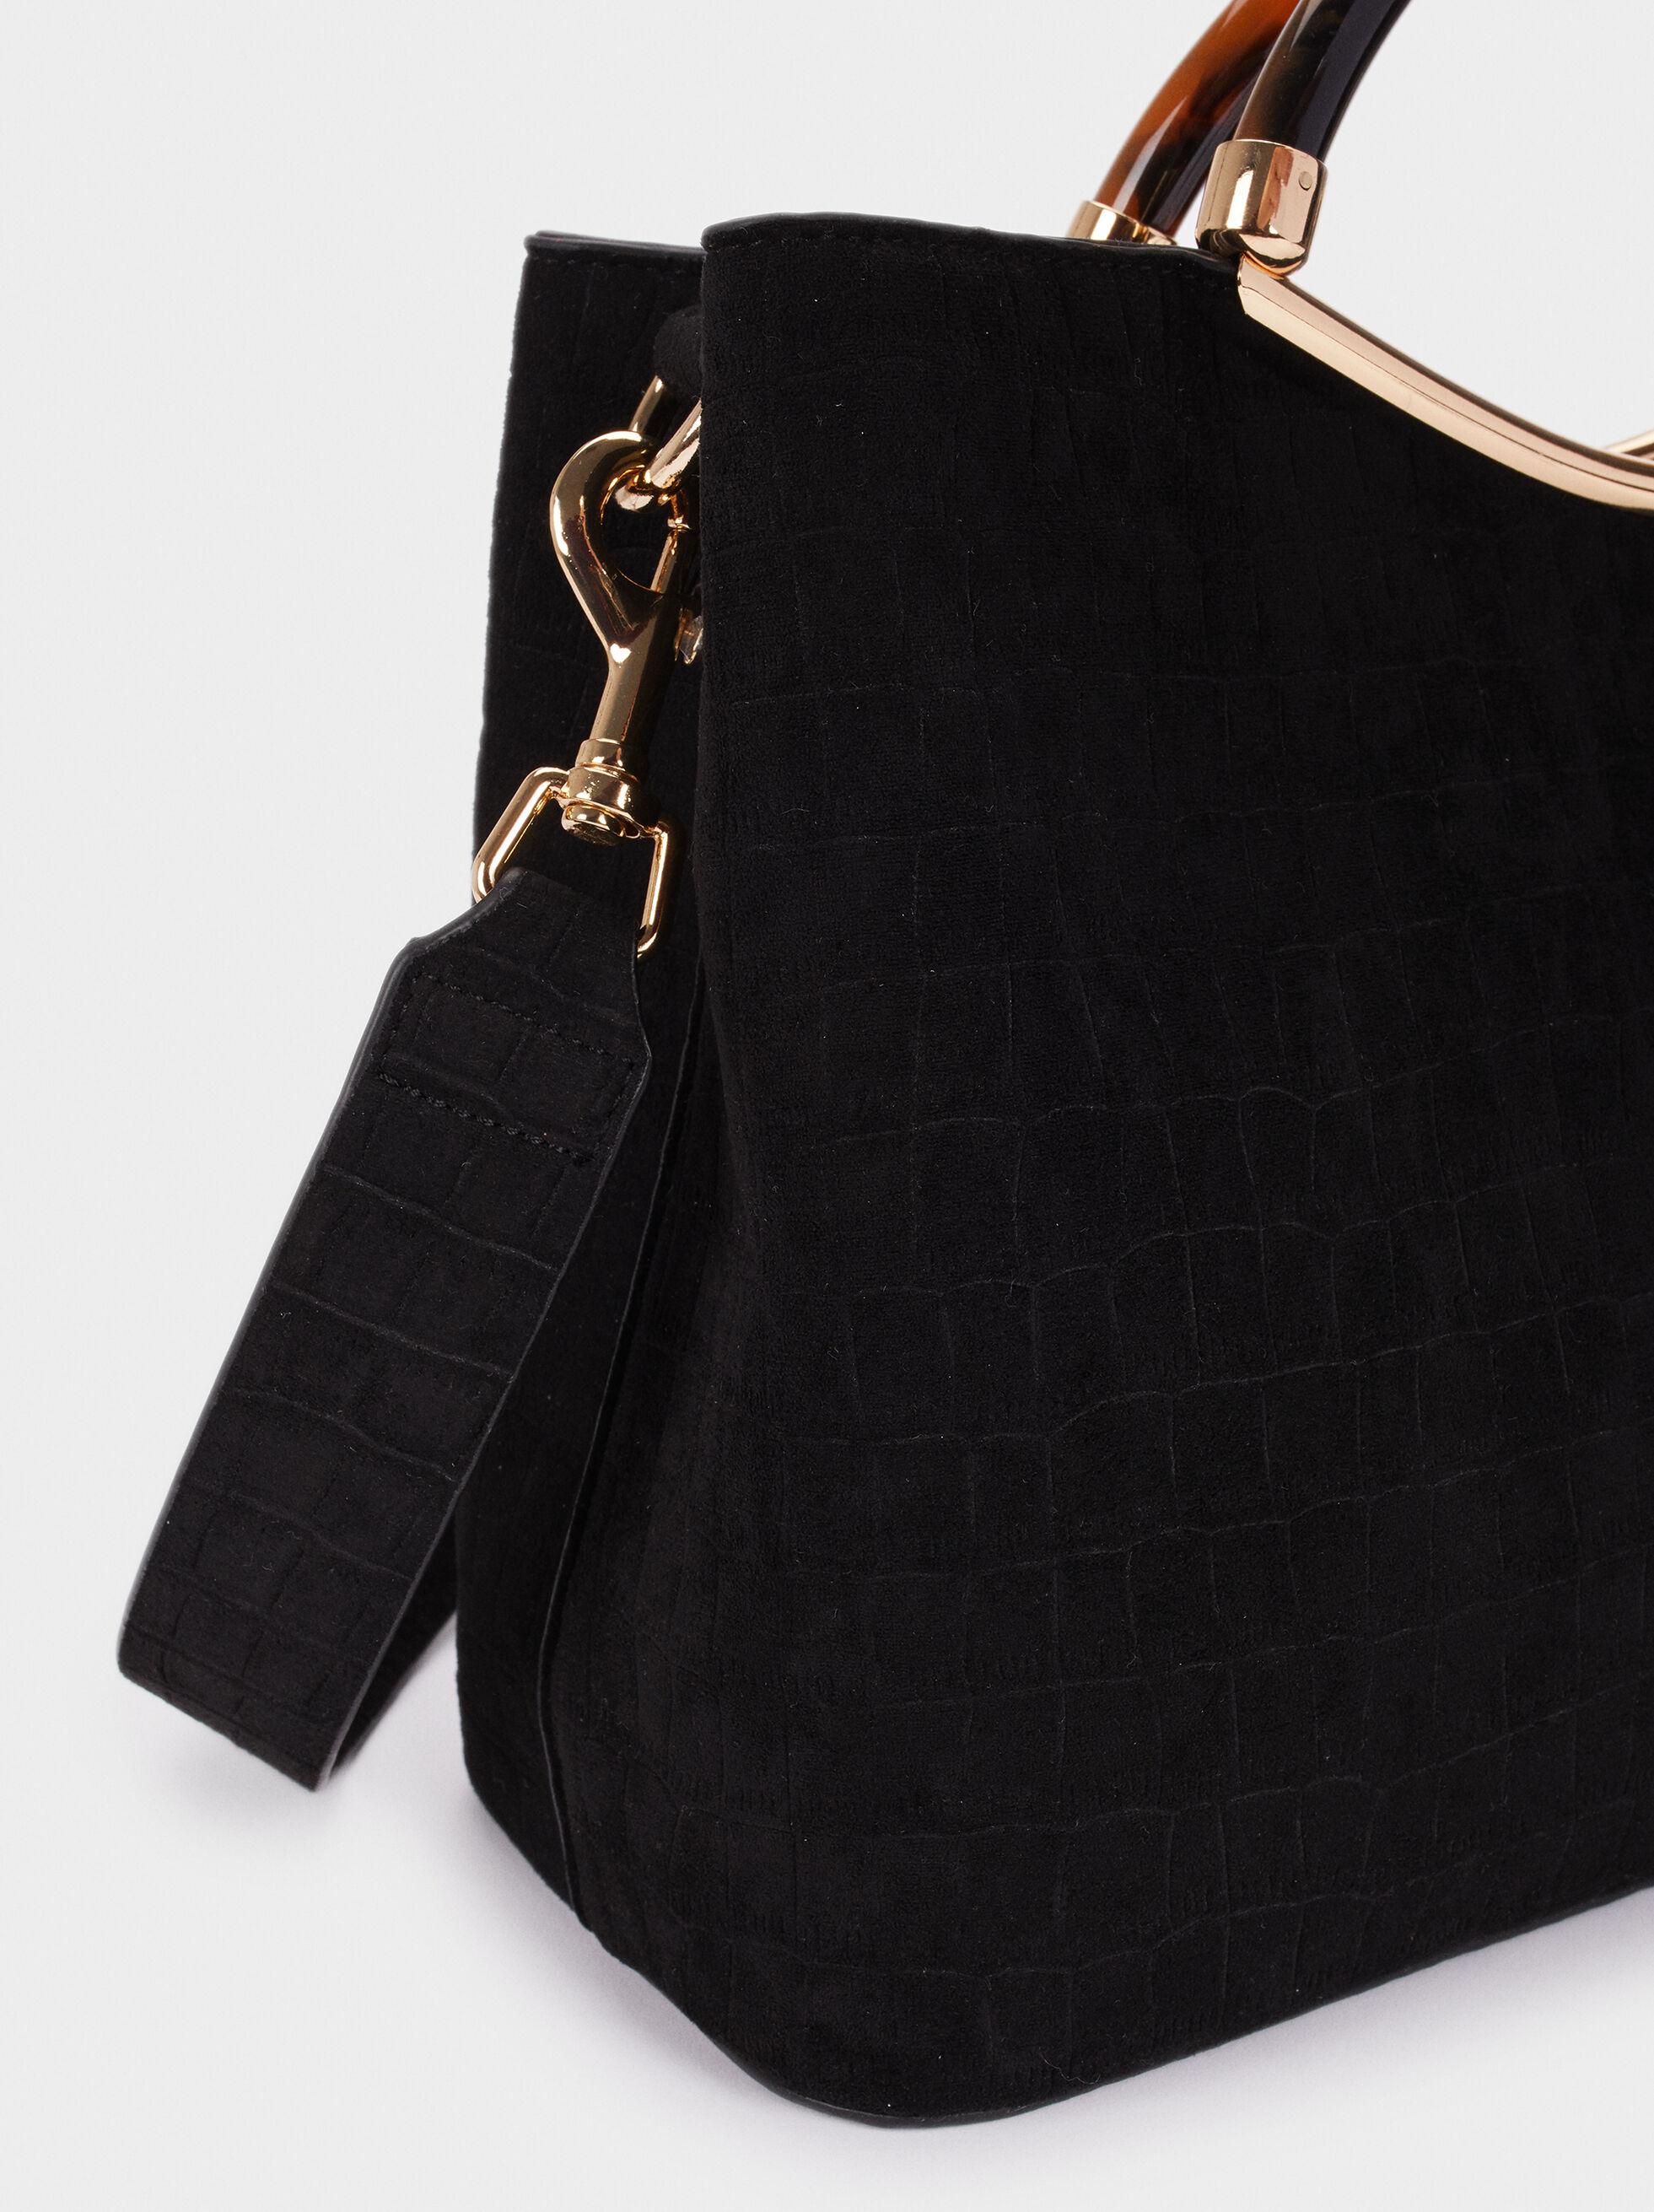 Fake Suede Tote Bag With Handle, Black, hi-res